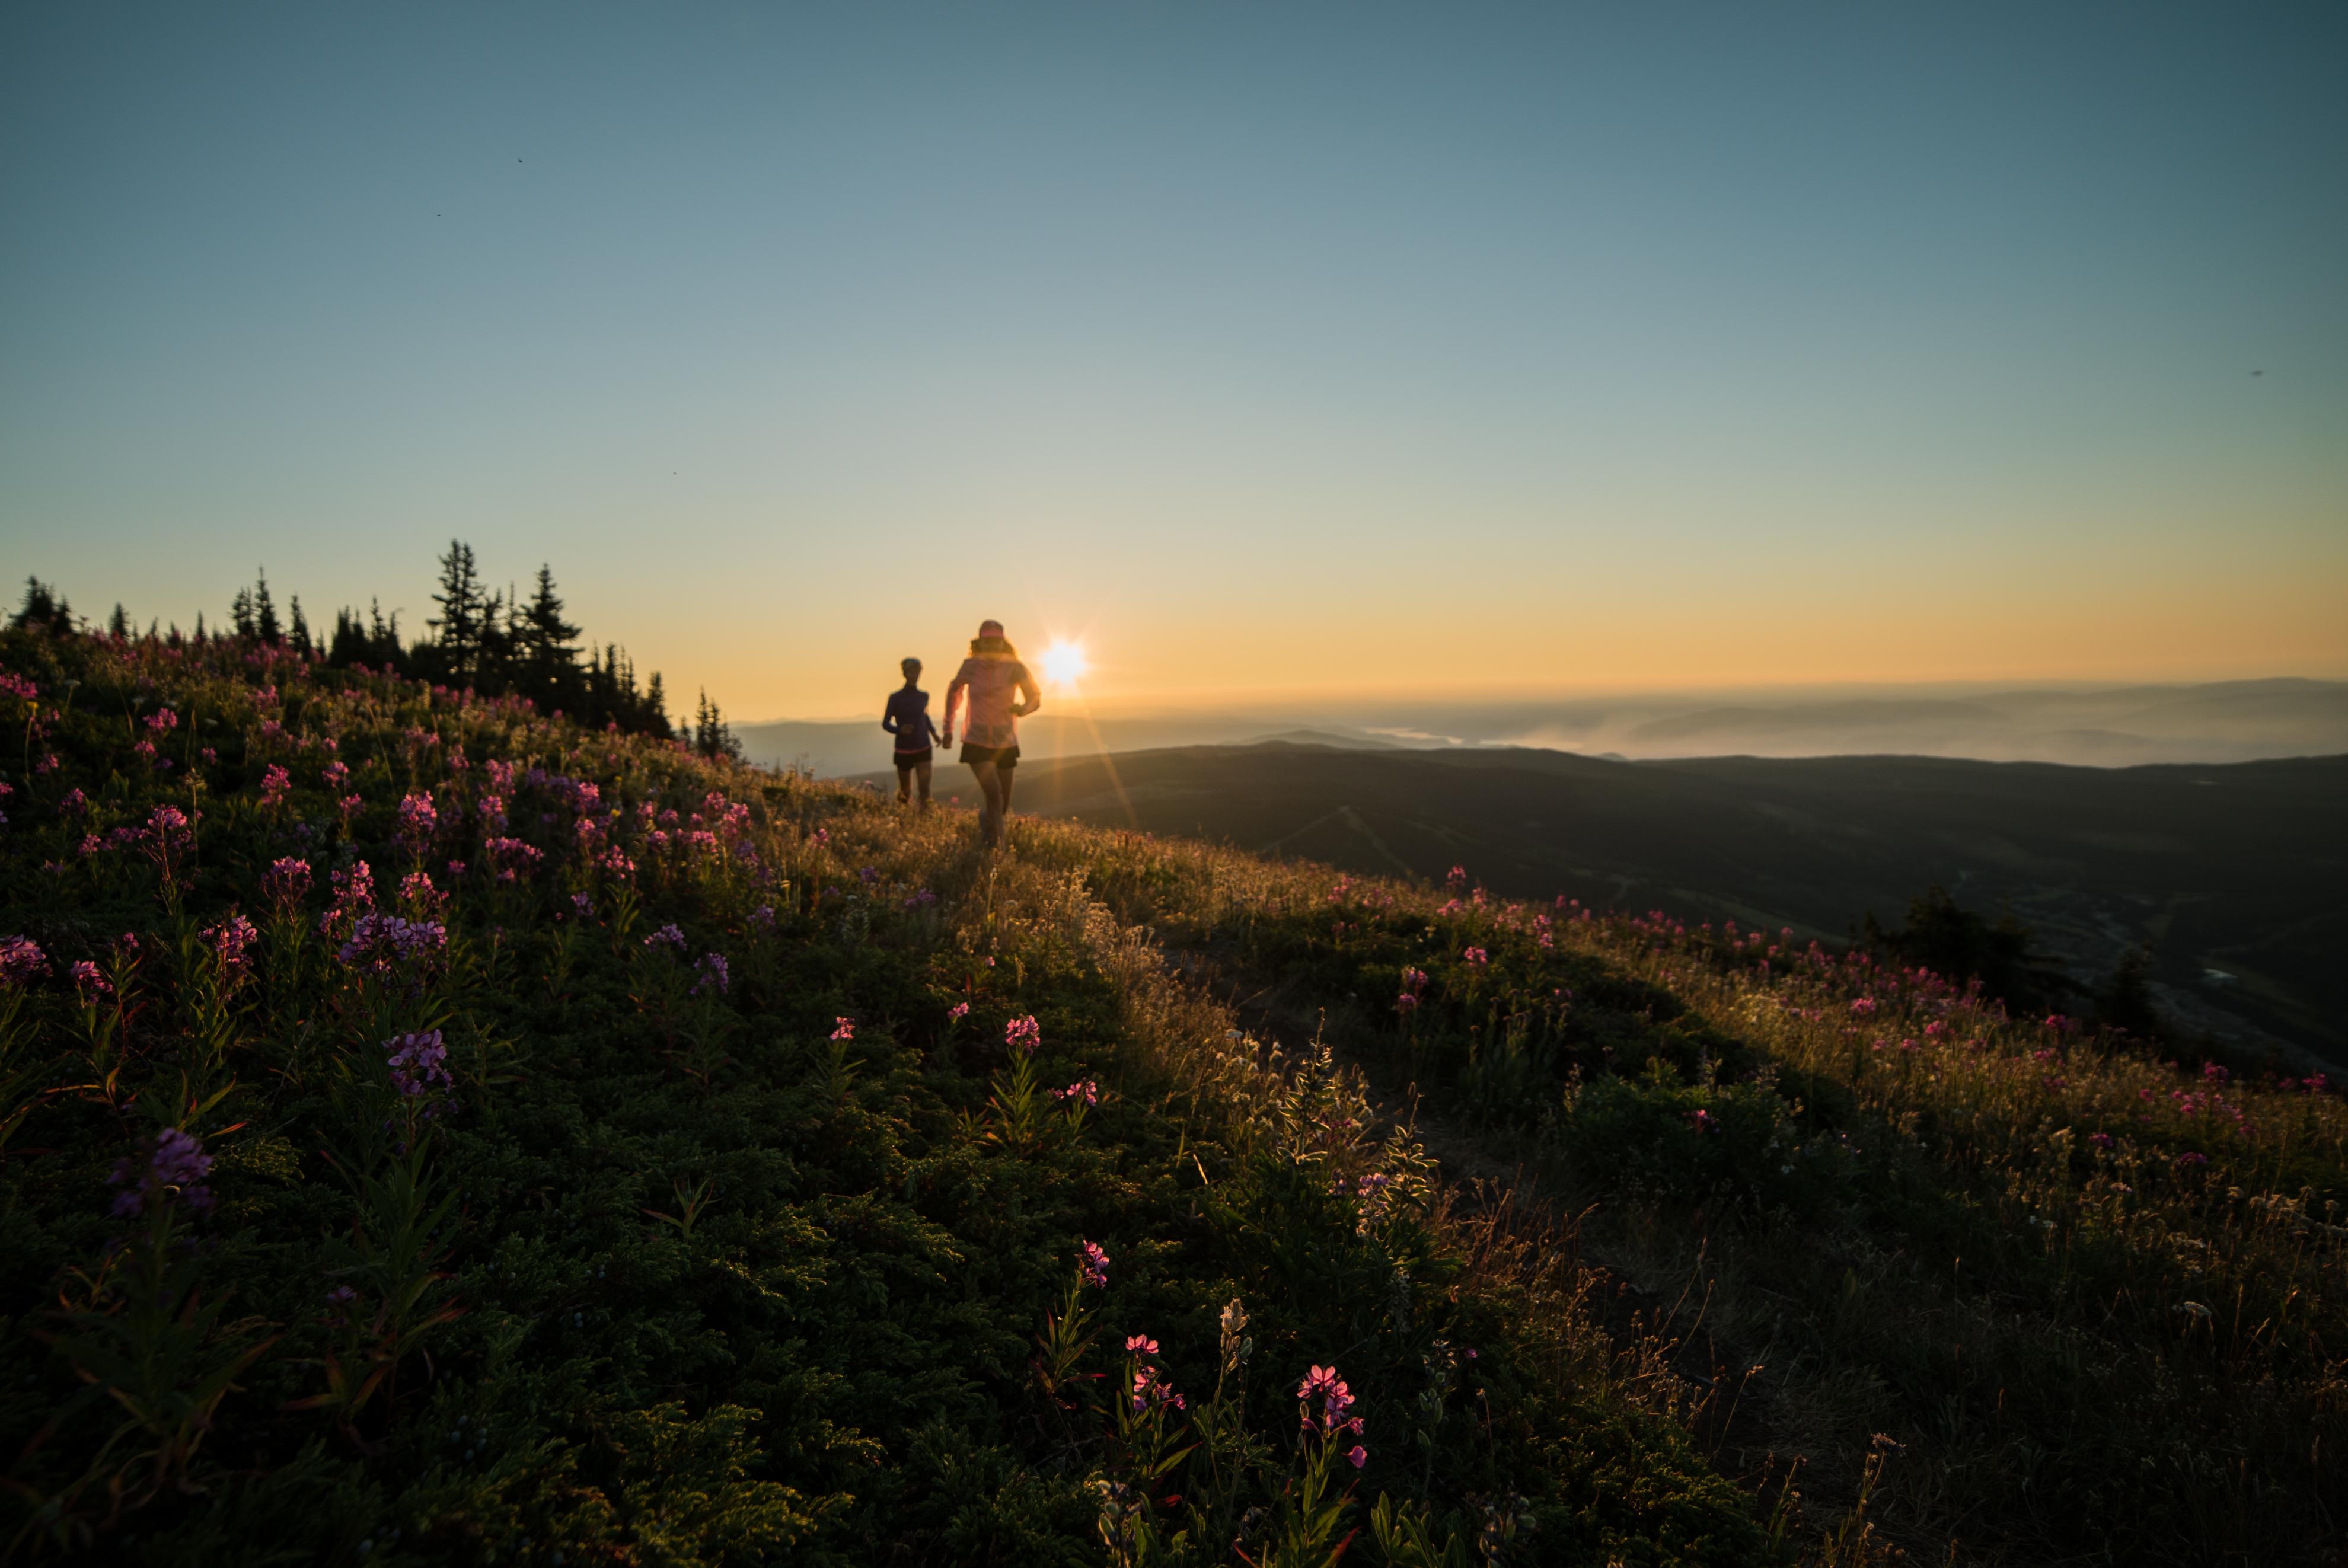 Sun peaks runners surise (1 of 1)